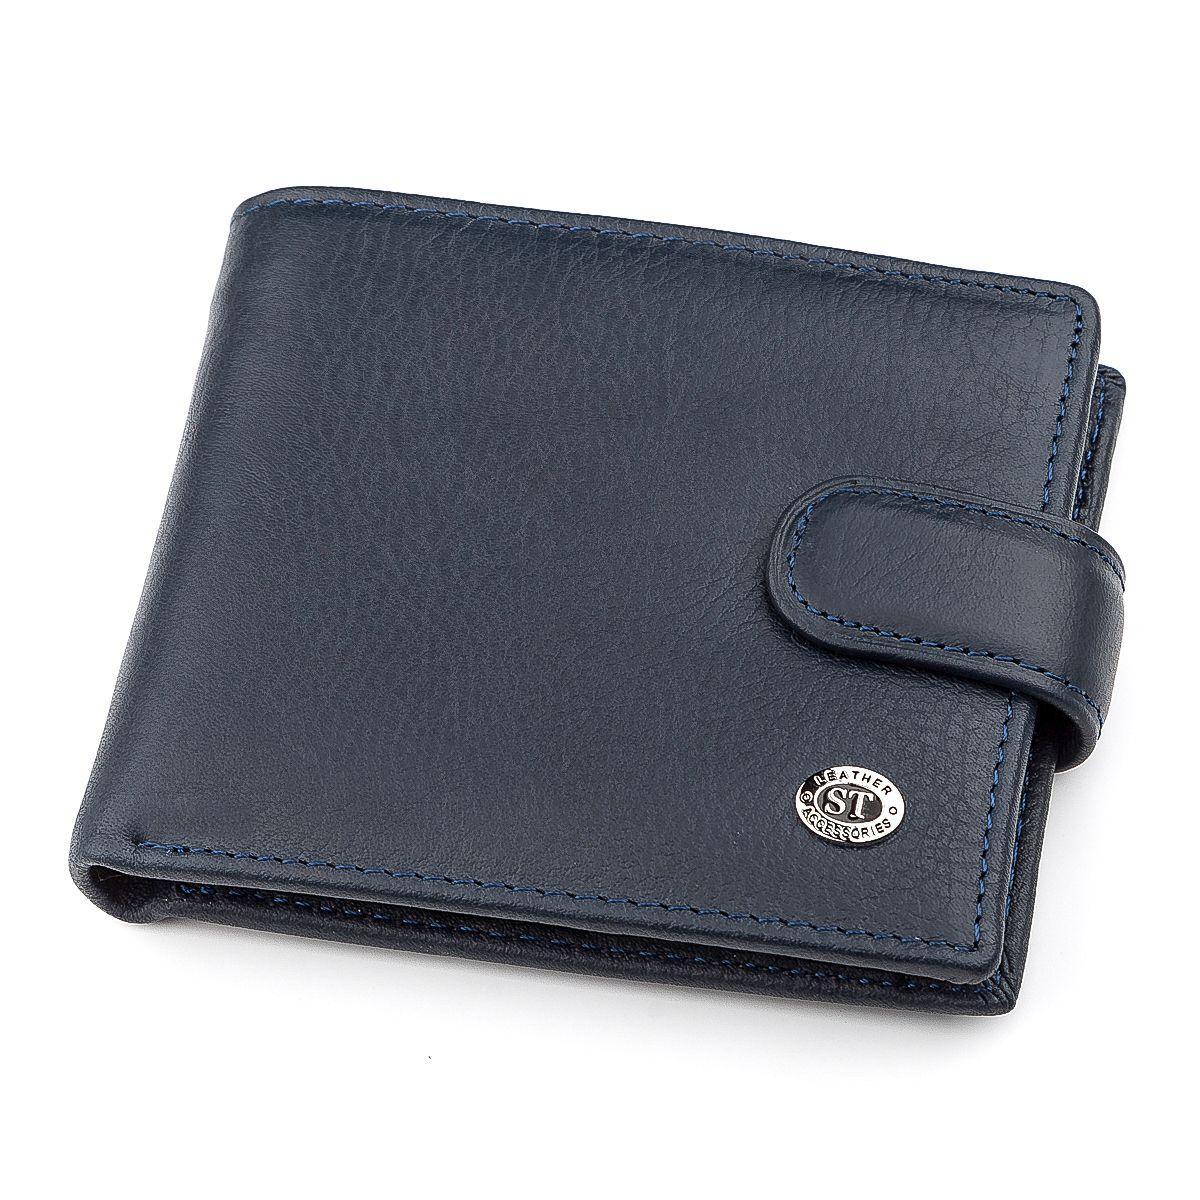 Мужской кошелек ST Leather 18312 (ST103) кожа Синий